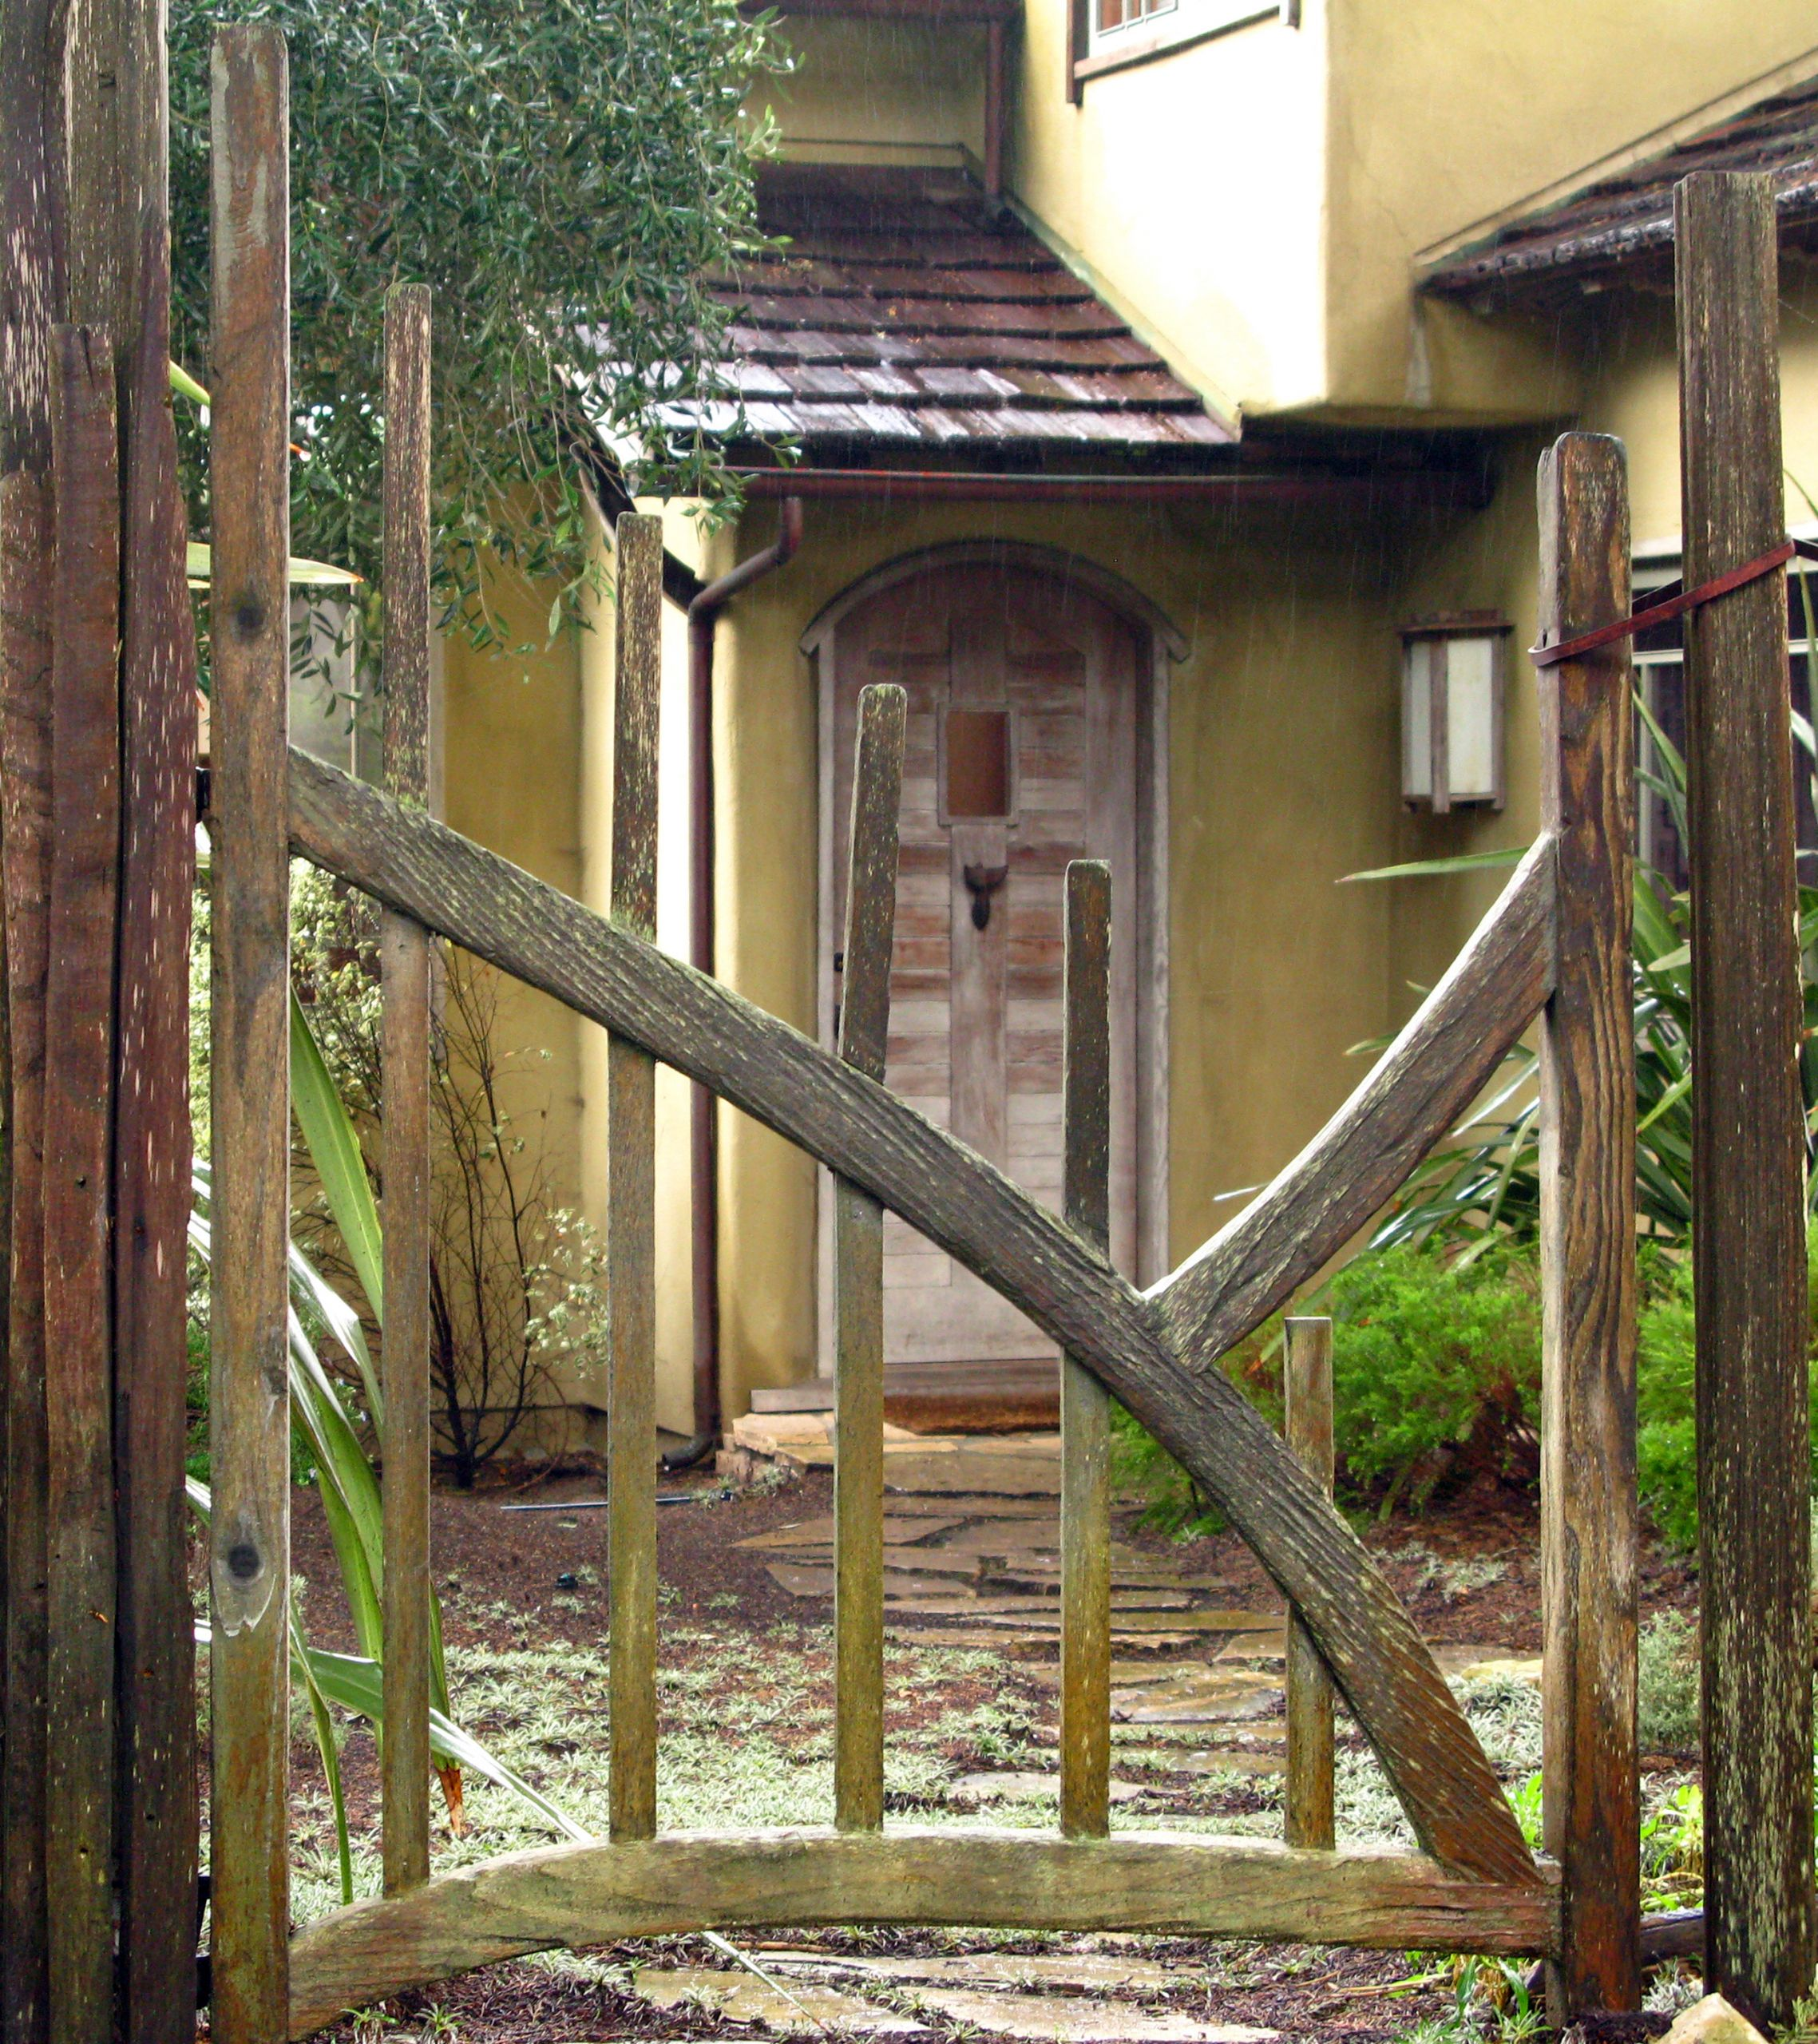 Backyard Fence Door  PDF How to build a backyard fence gate DIY Free Plans